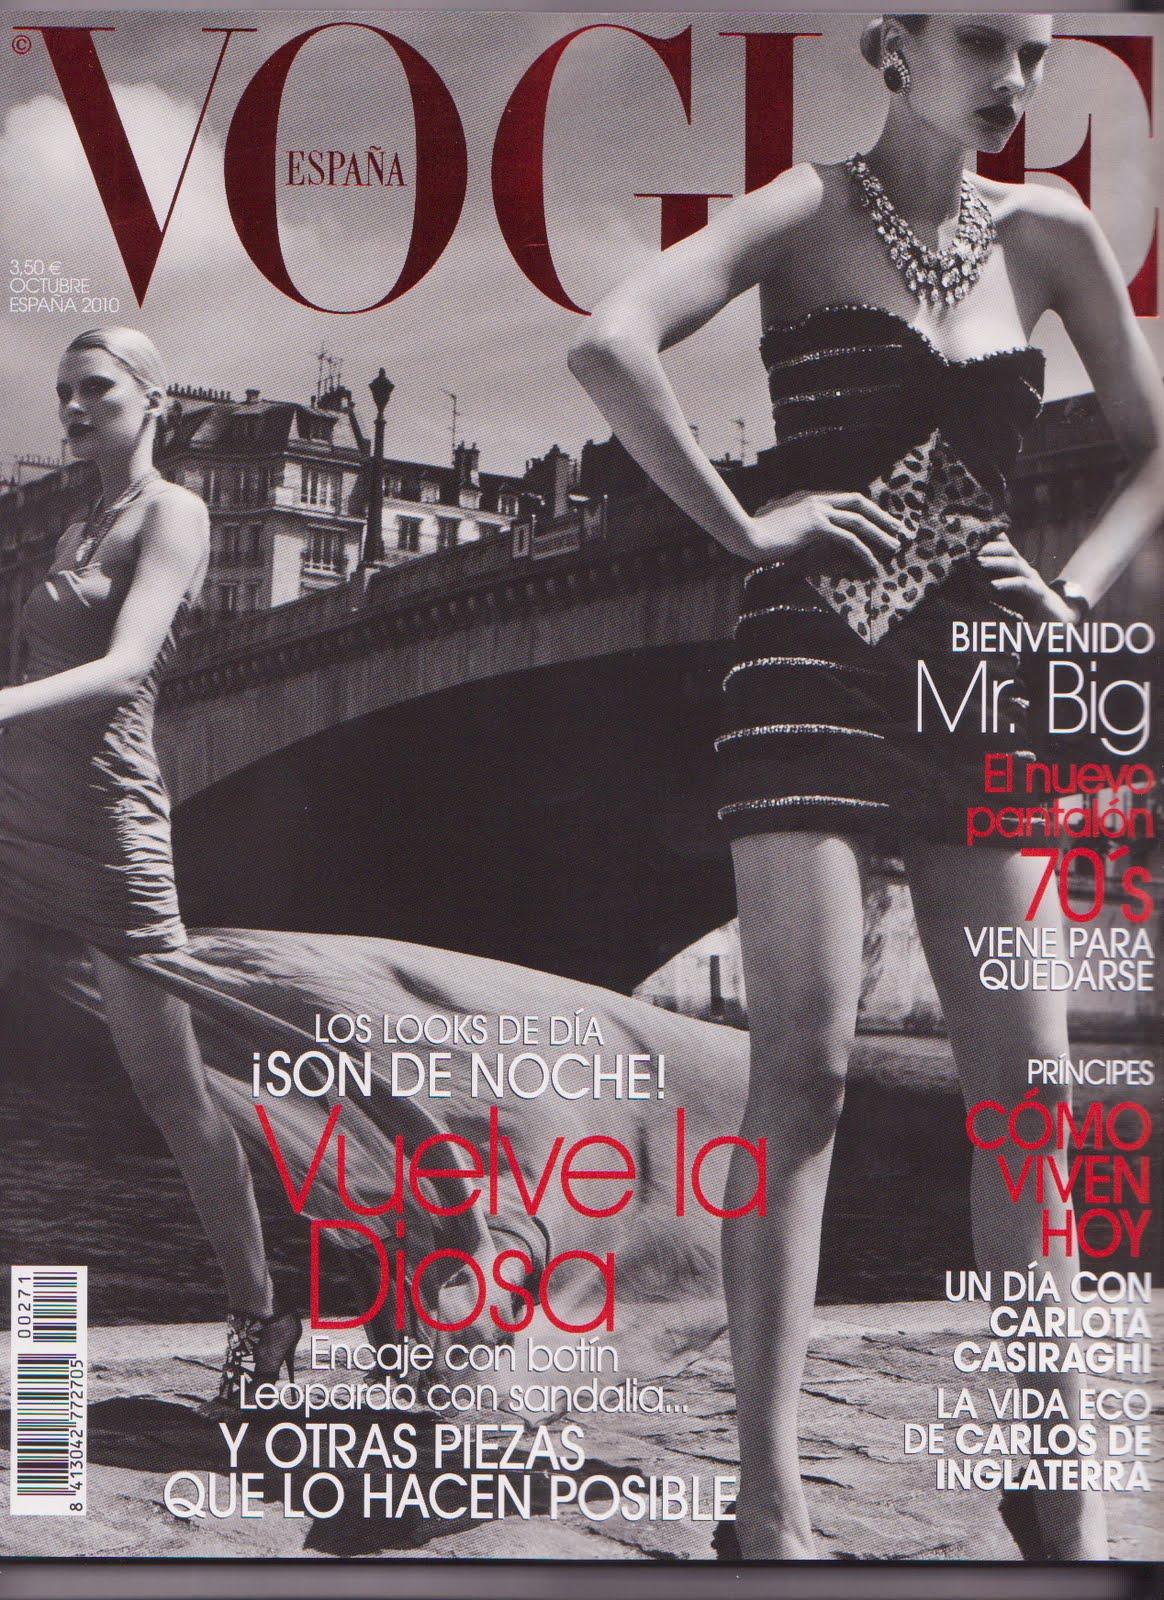 http://2.bp.blogspot.com/_e0DkE-3x4L4/TM1JjEmRvuI/AAAAAAAAEJw/N0LAzFlfD5E/s1600/Elena+Melnik+Vogue+Spain.jpg